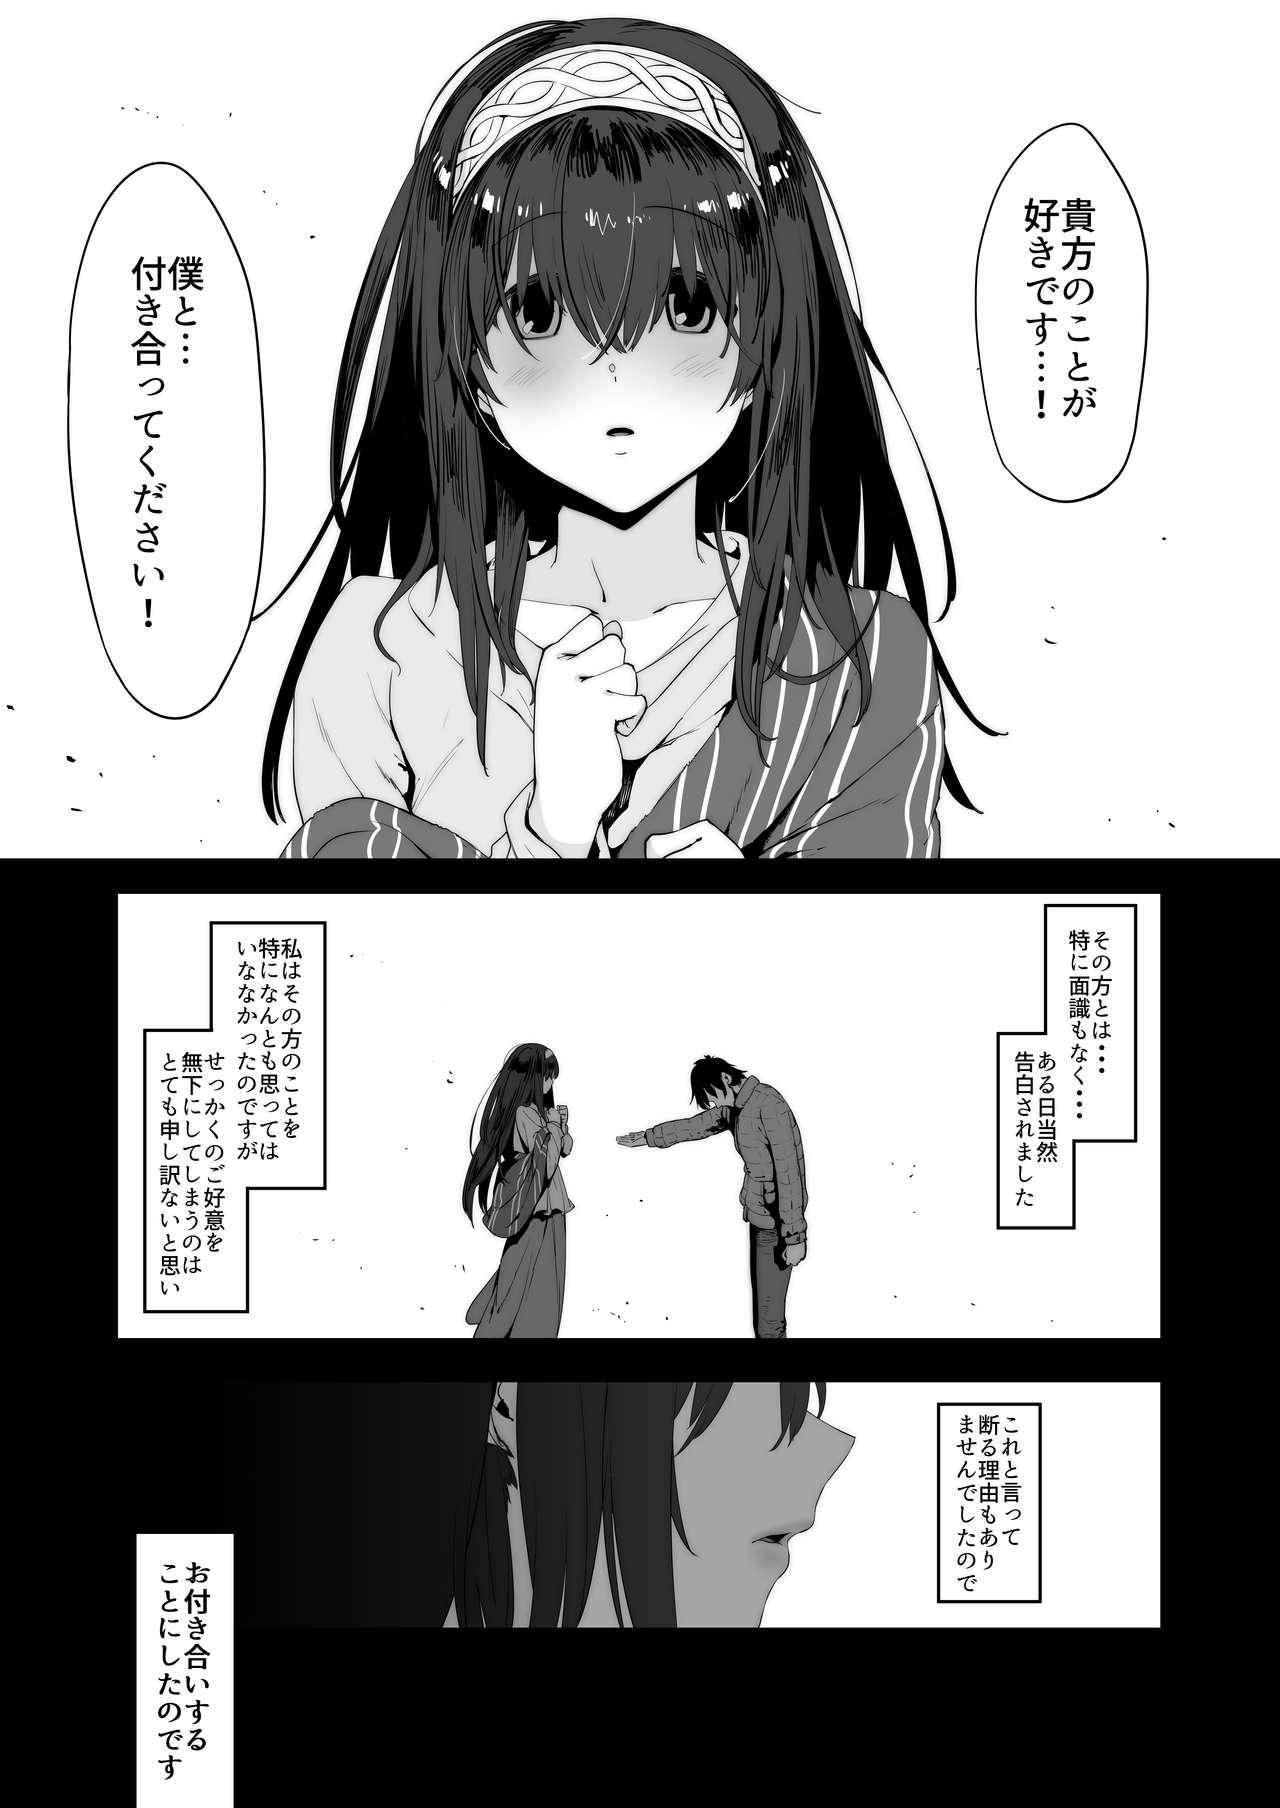 Sagisawa Fumika wa Yoku Moteru 2